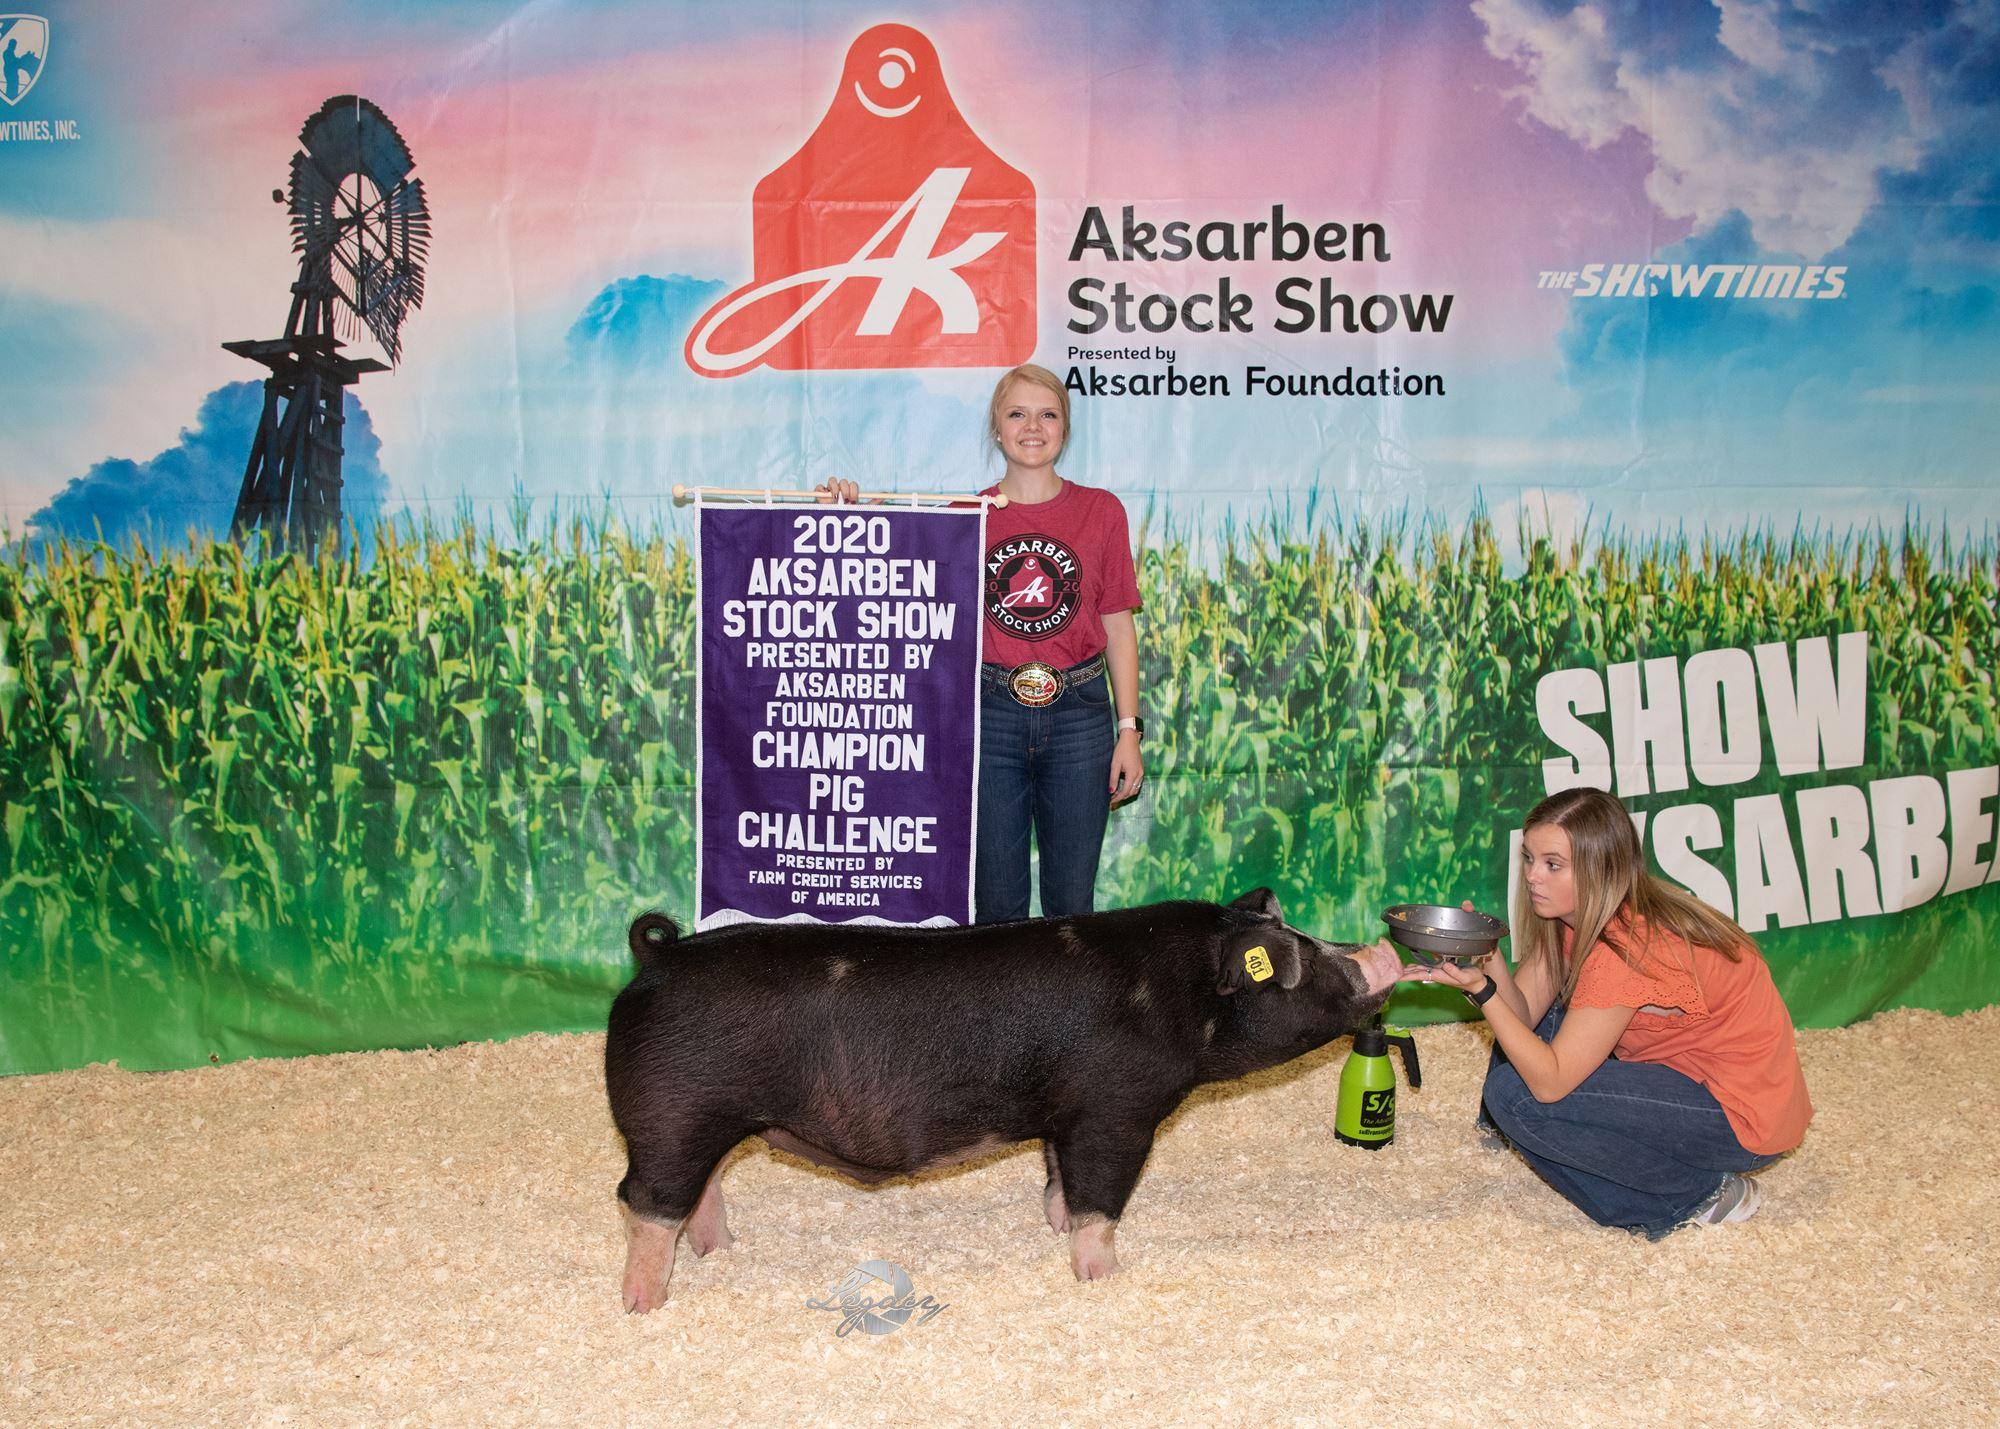 Grand Champion Pig Challenge